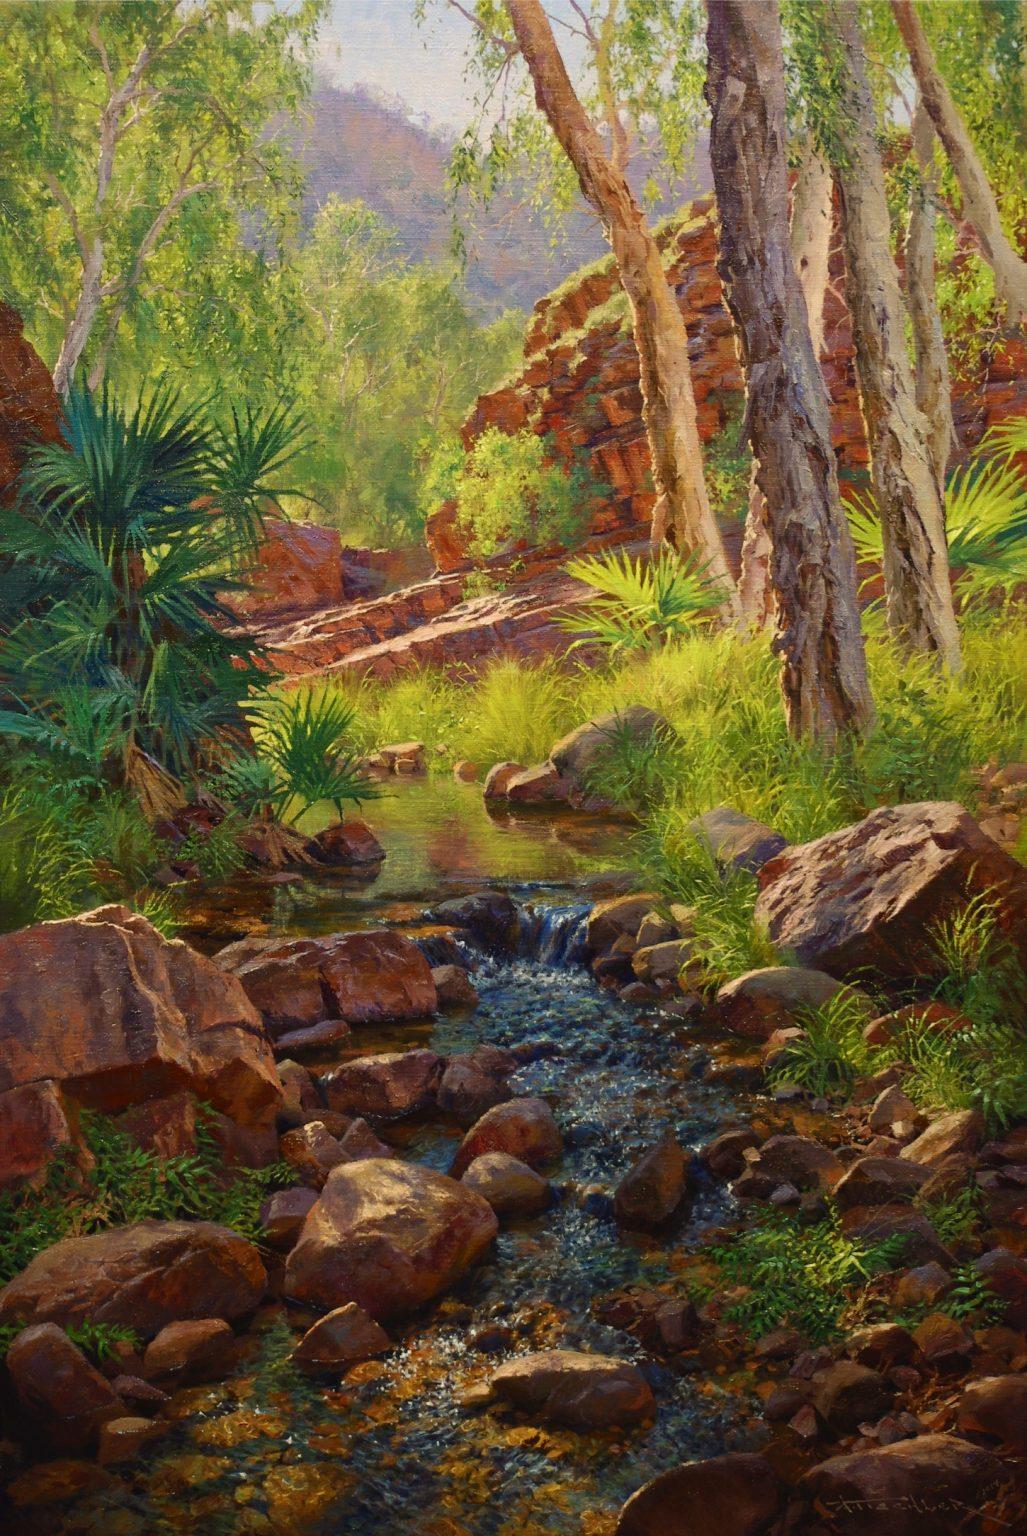 Andrew Tischler's Amelia Gorge oil painting product